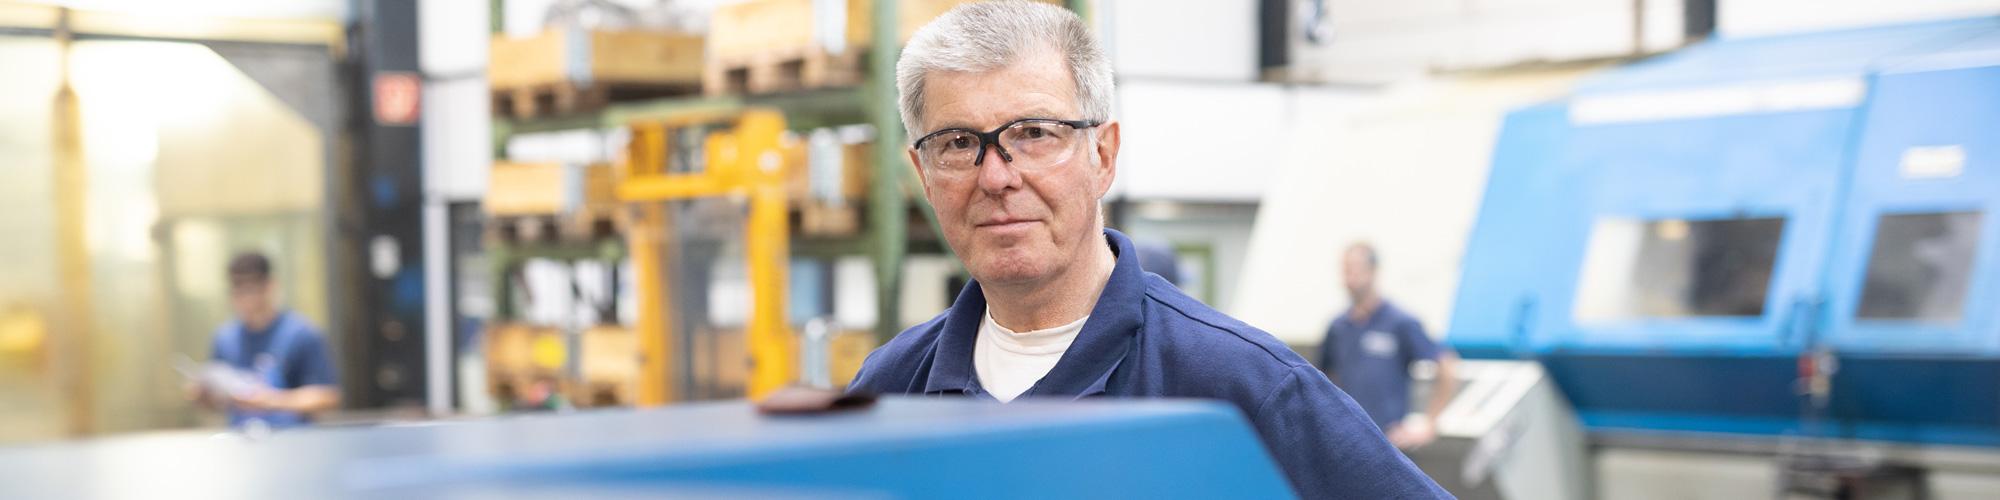 Geukes GmbH - Maschinenbau - Bocholt